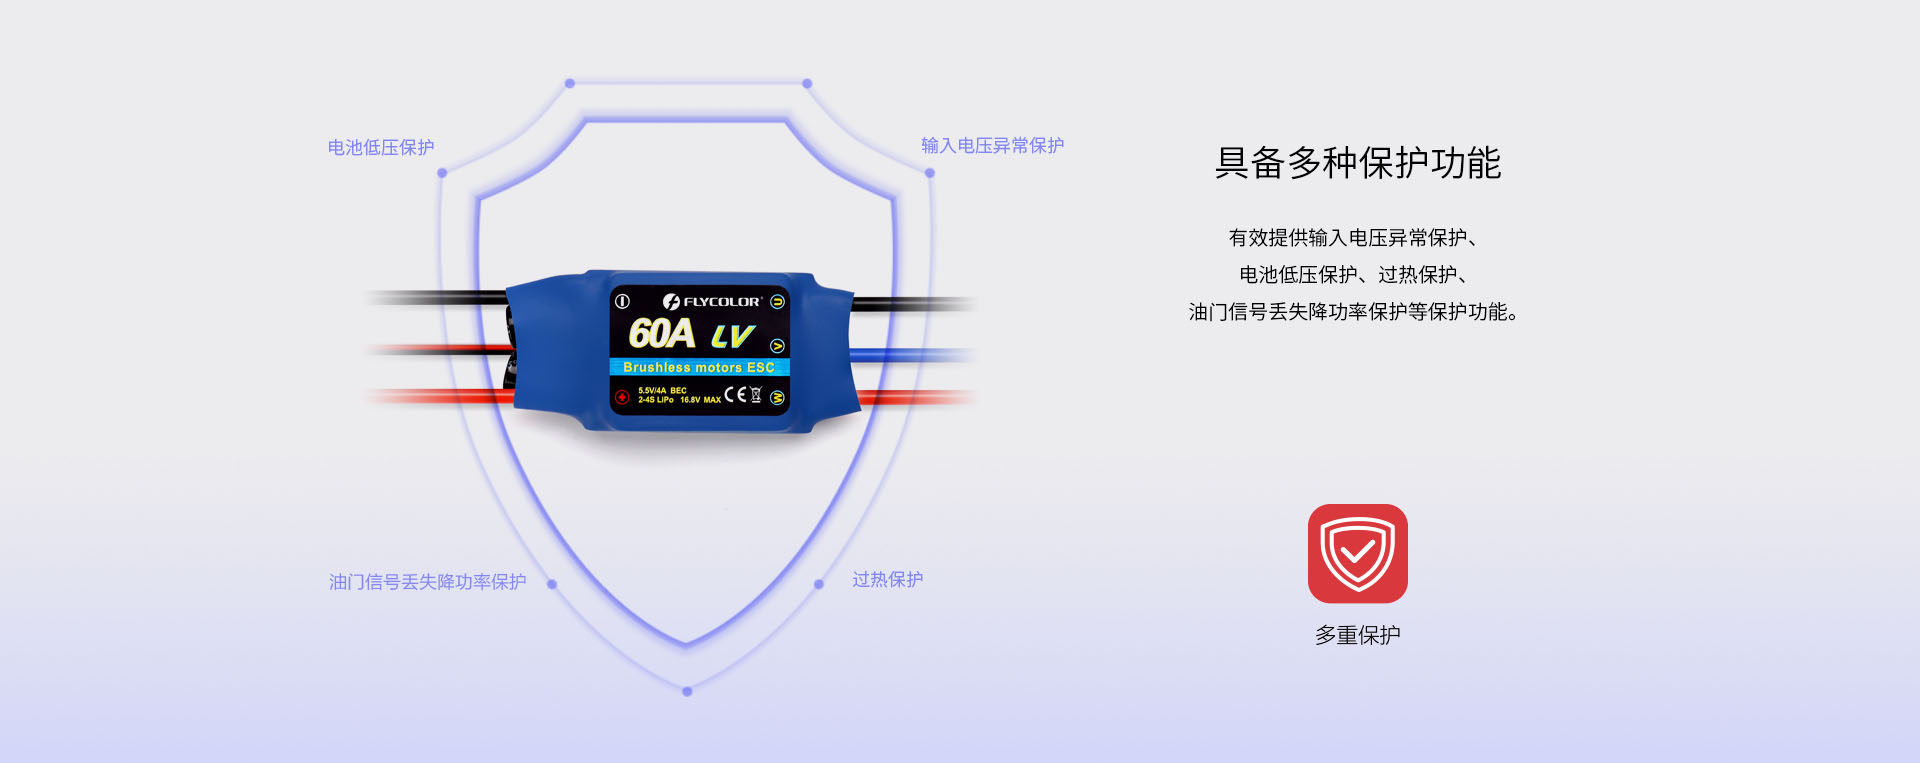 img-2-多功能保护.jpg